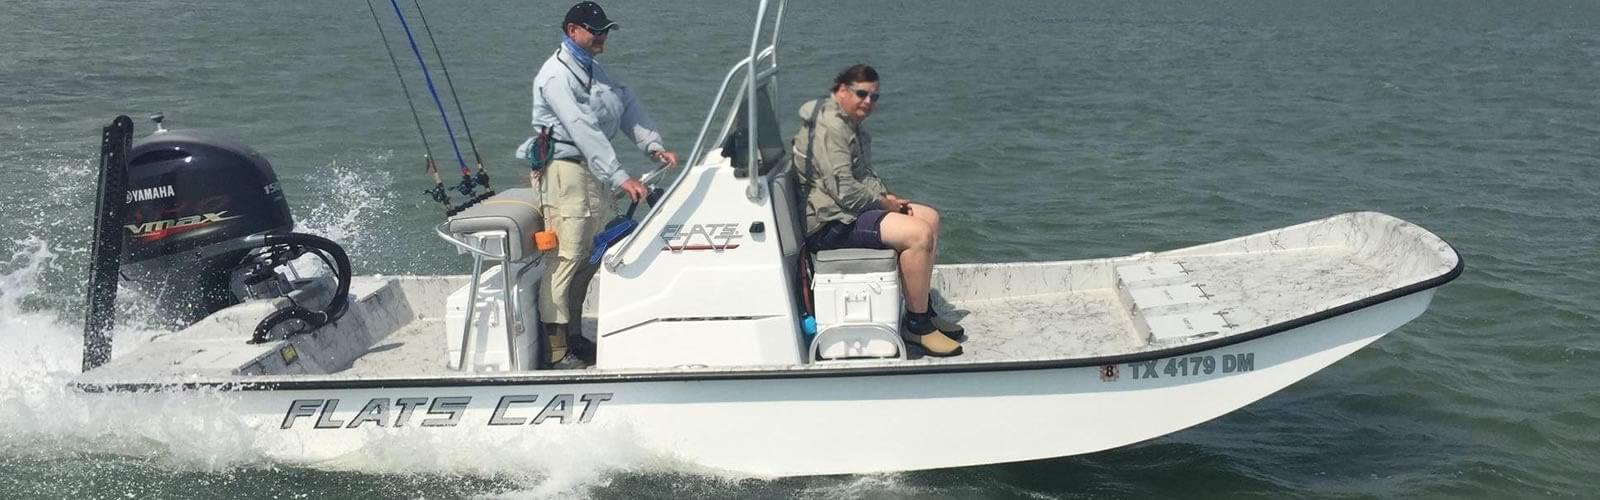 Shallow Water Boats >> Flats Cat Boat Shallow Water Catamaran Flats Fishing Boat